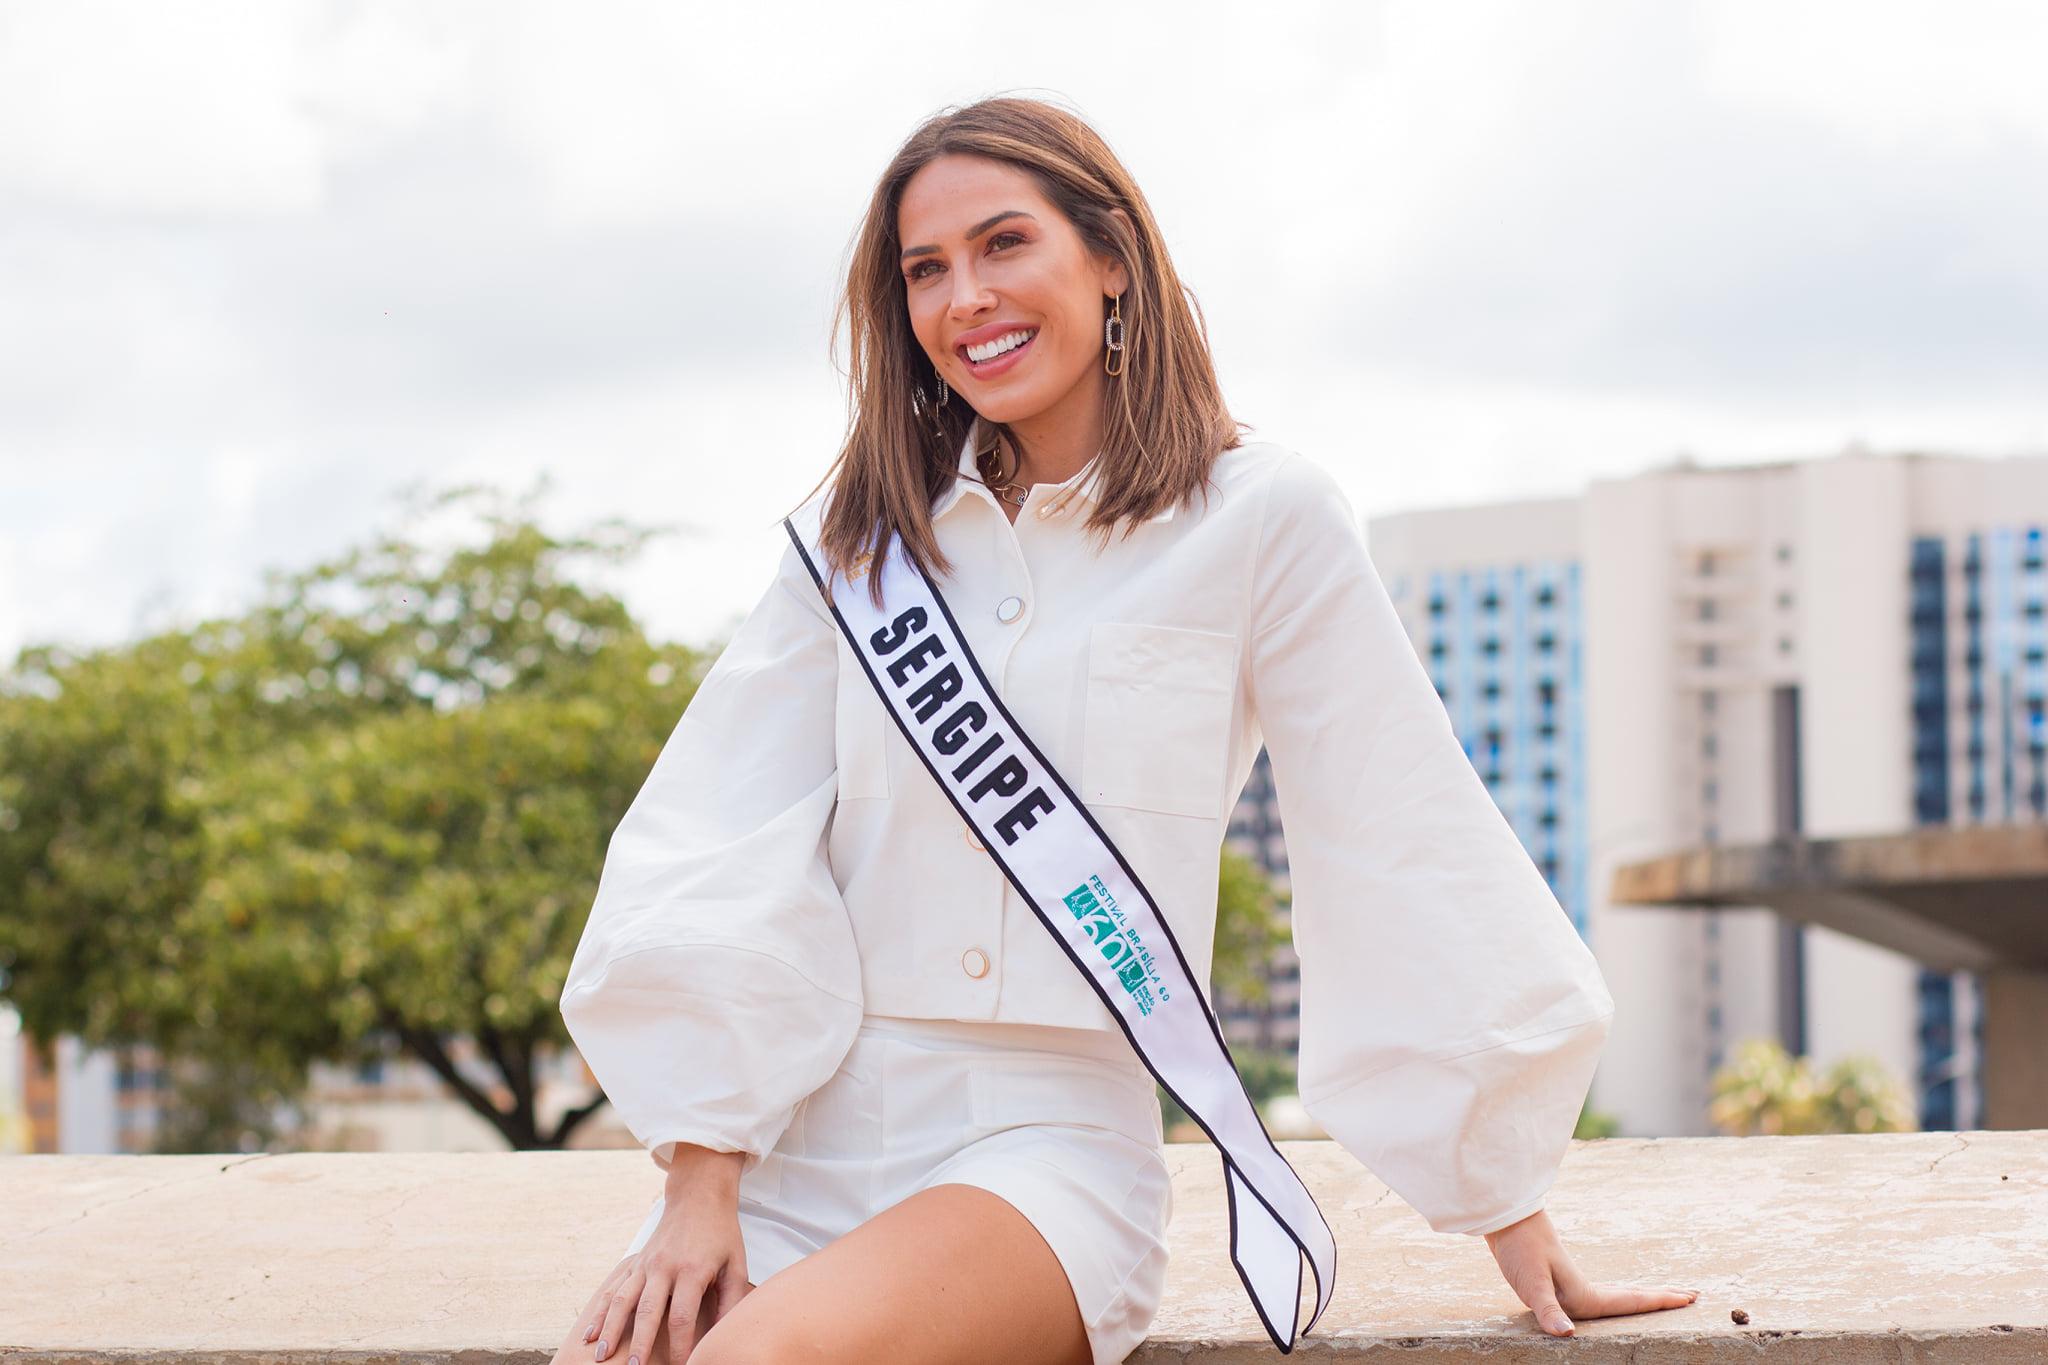 bruna zanardo, 1st runner-up de miss supranational brazil 2020/miss brasil internacional 2017/miss brasil terra 2016. - Página 17 12723810